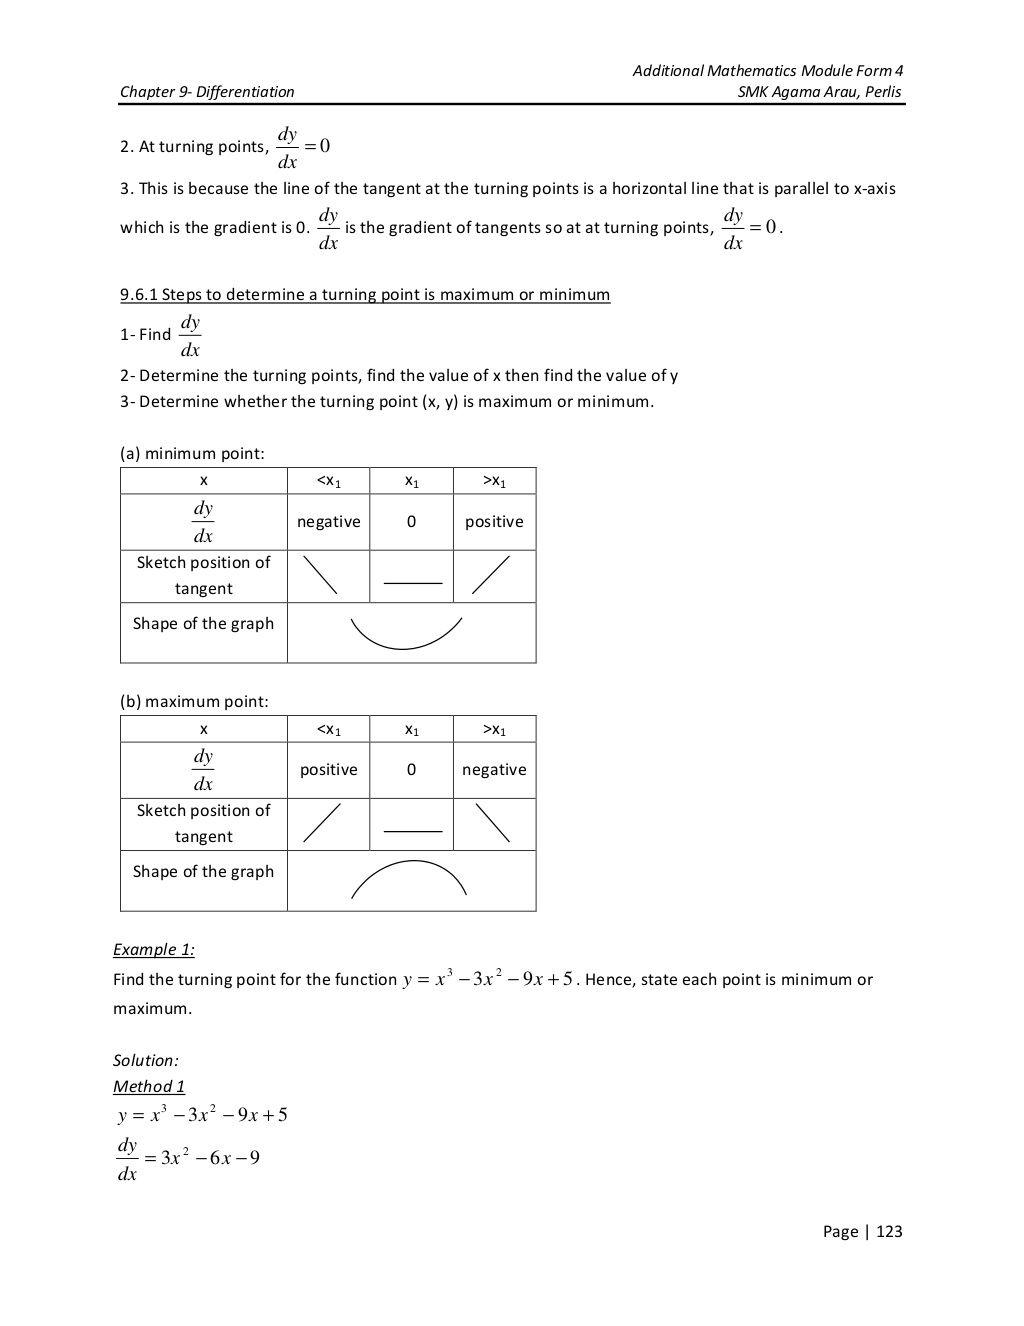 Additional Mathematics Module Form 4Chapter 9